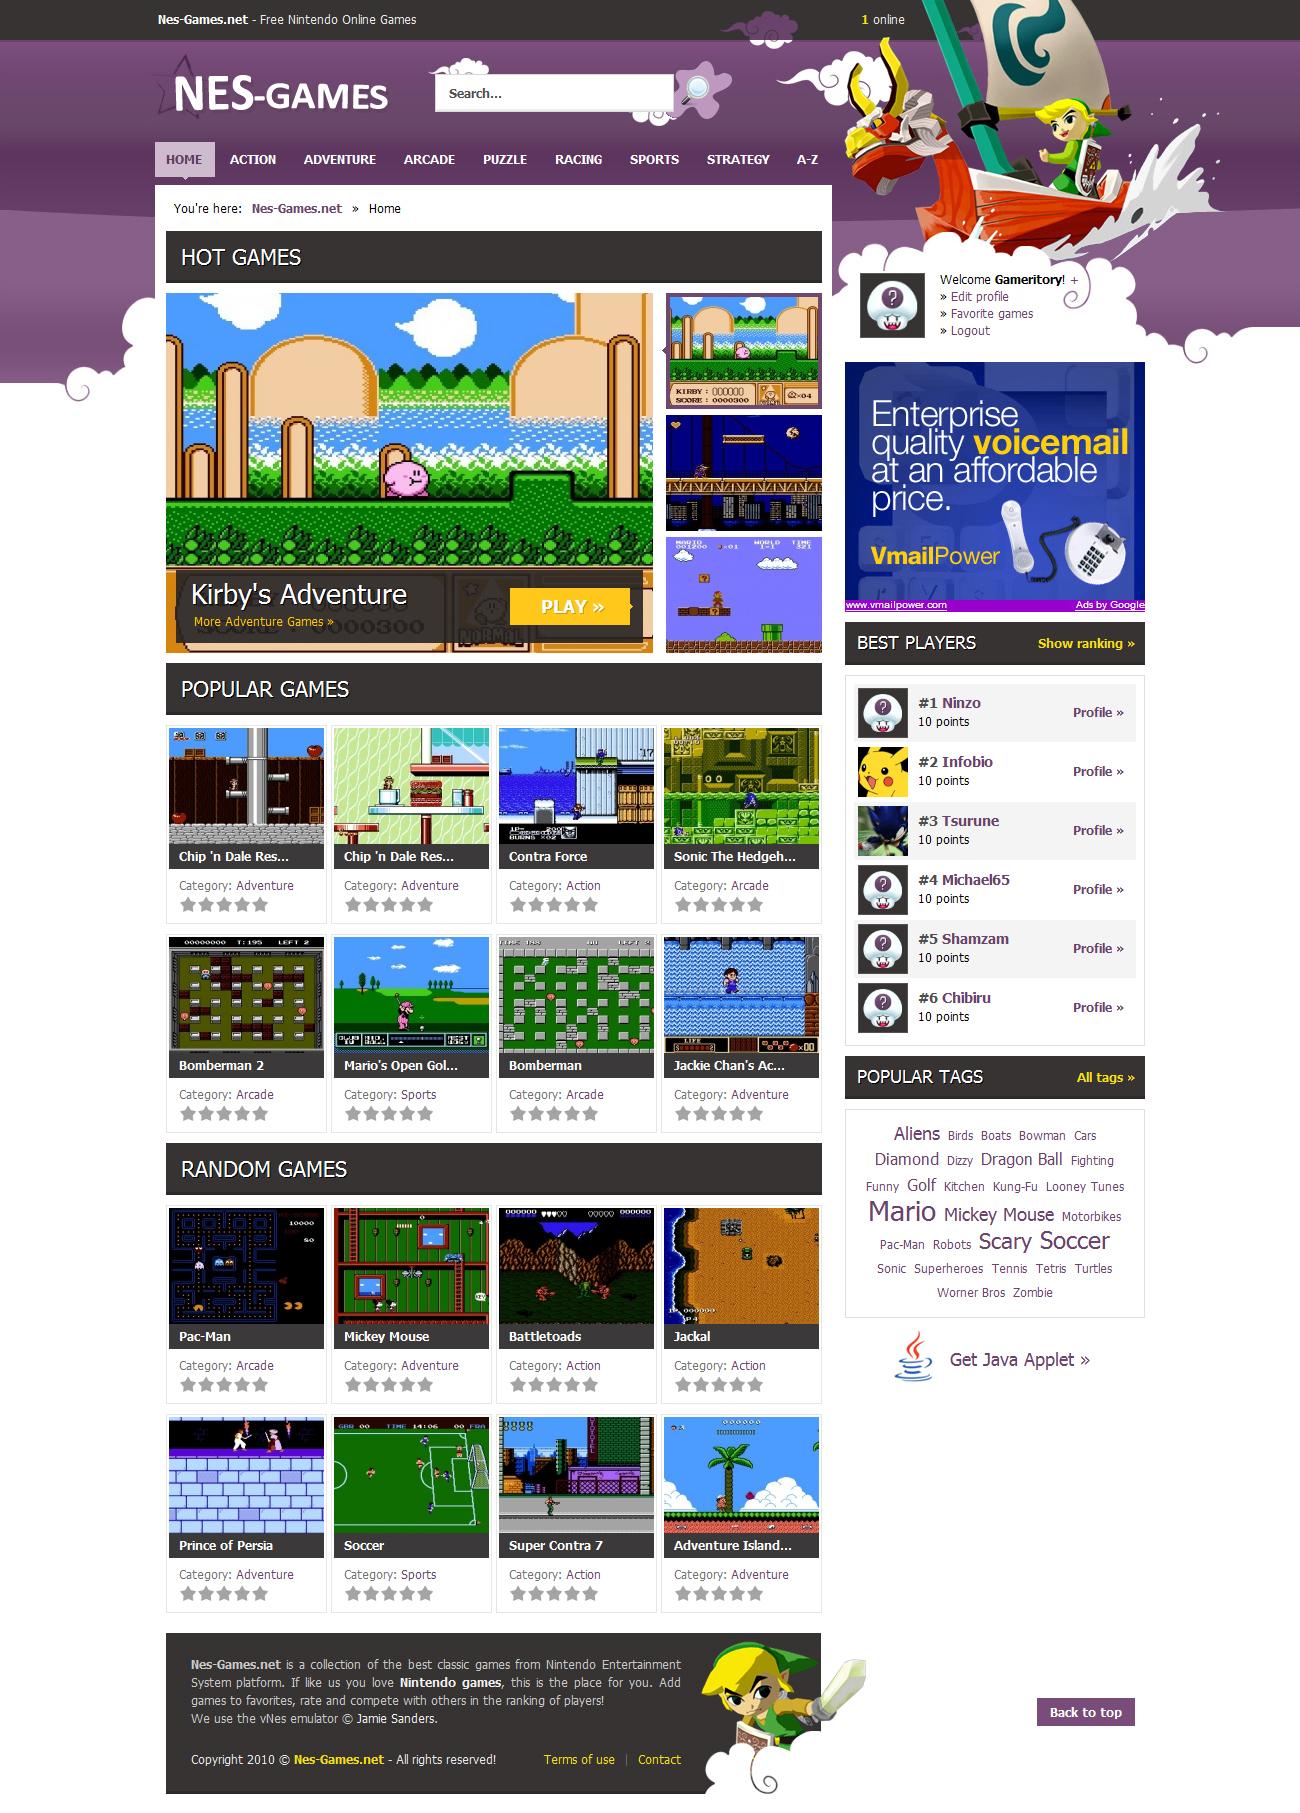 Nes-Games.net by kibus